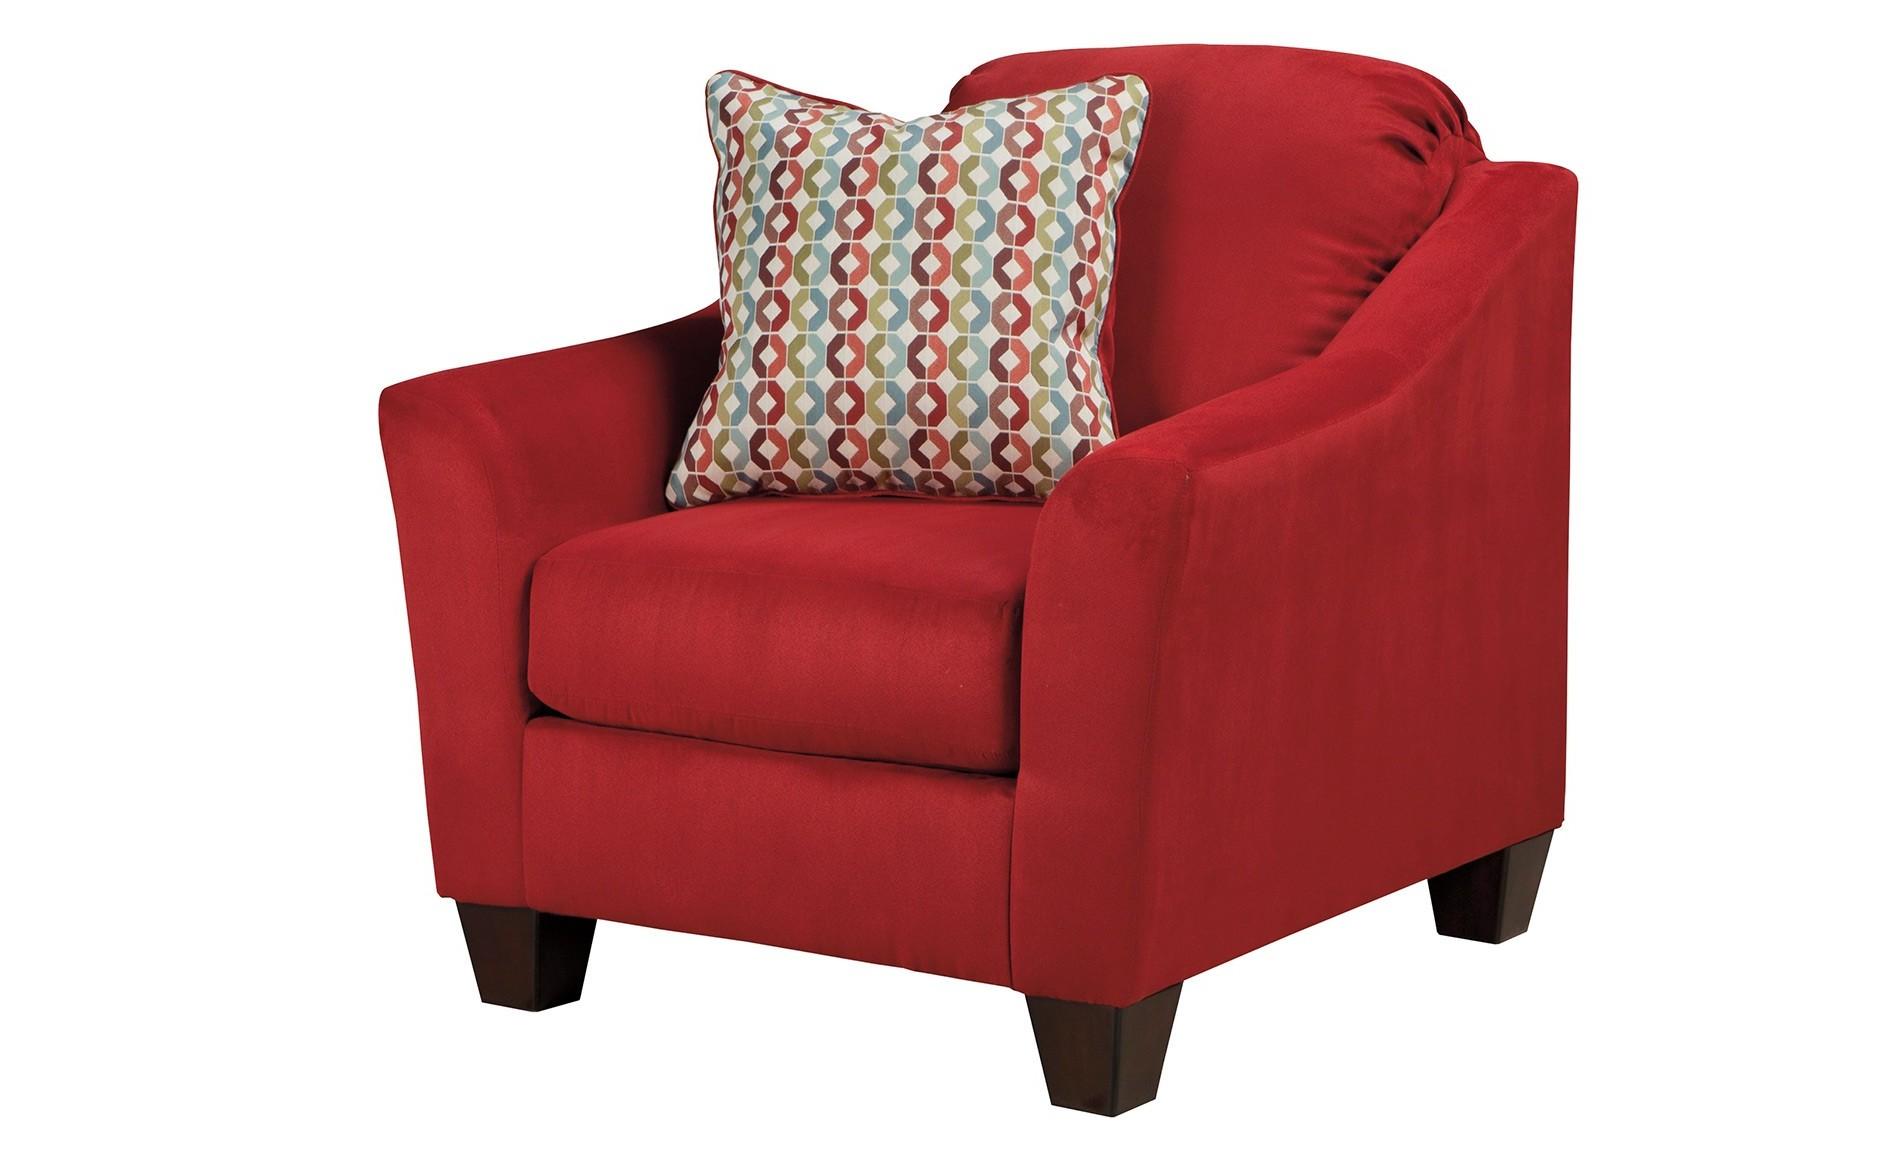 Empire Furniture Rental image 14